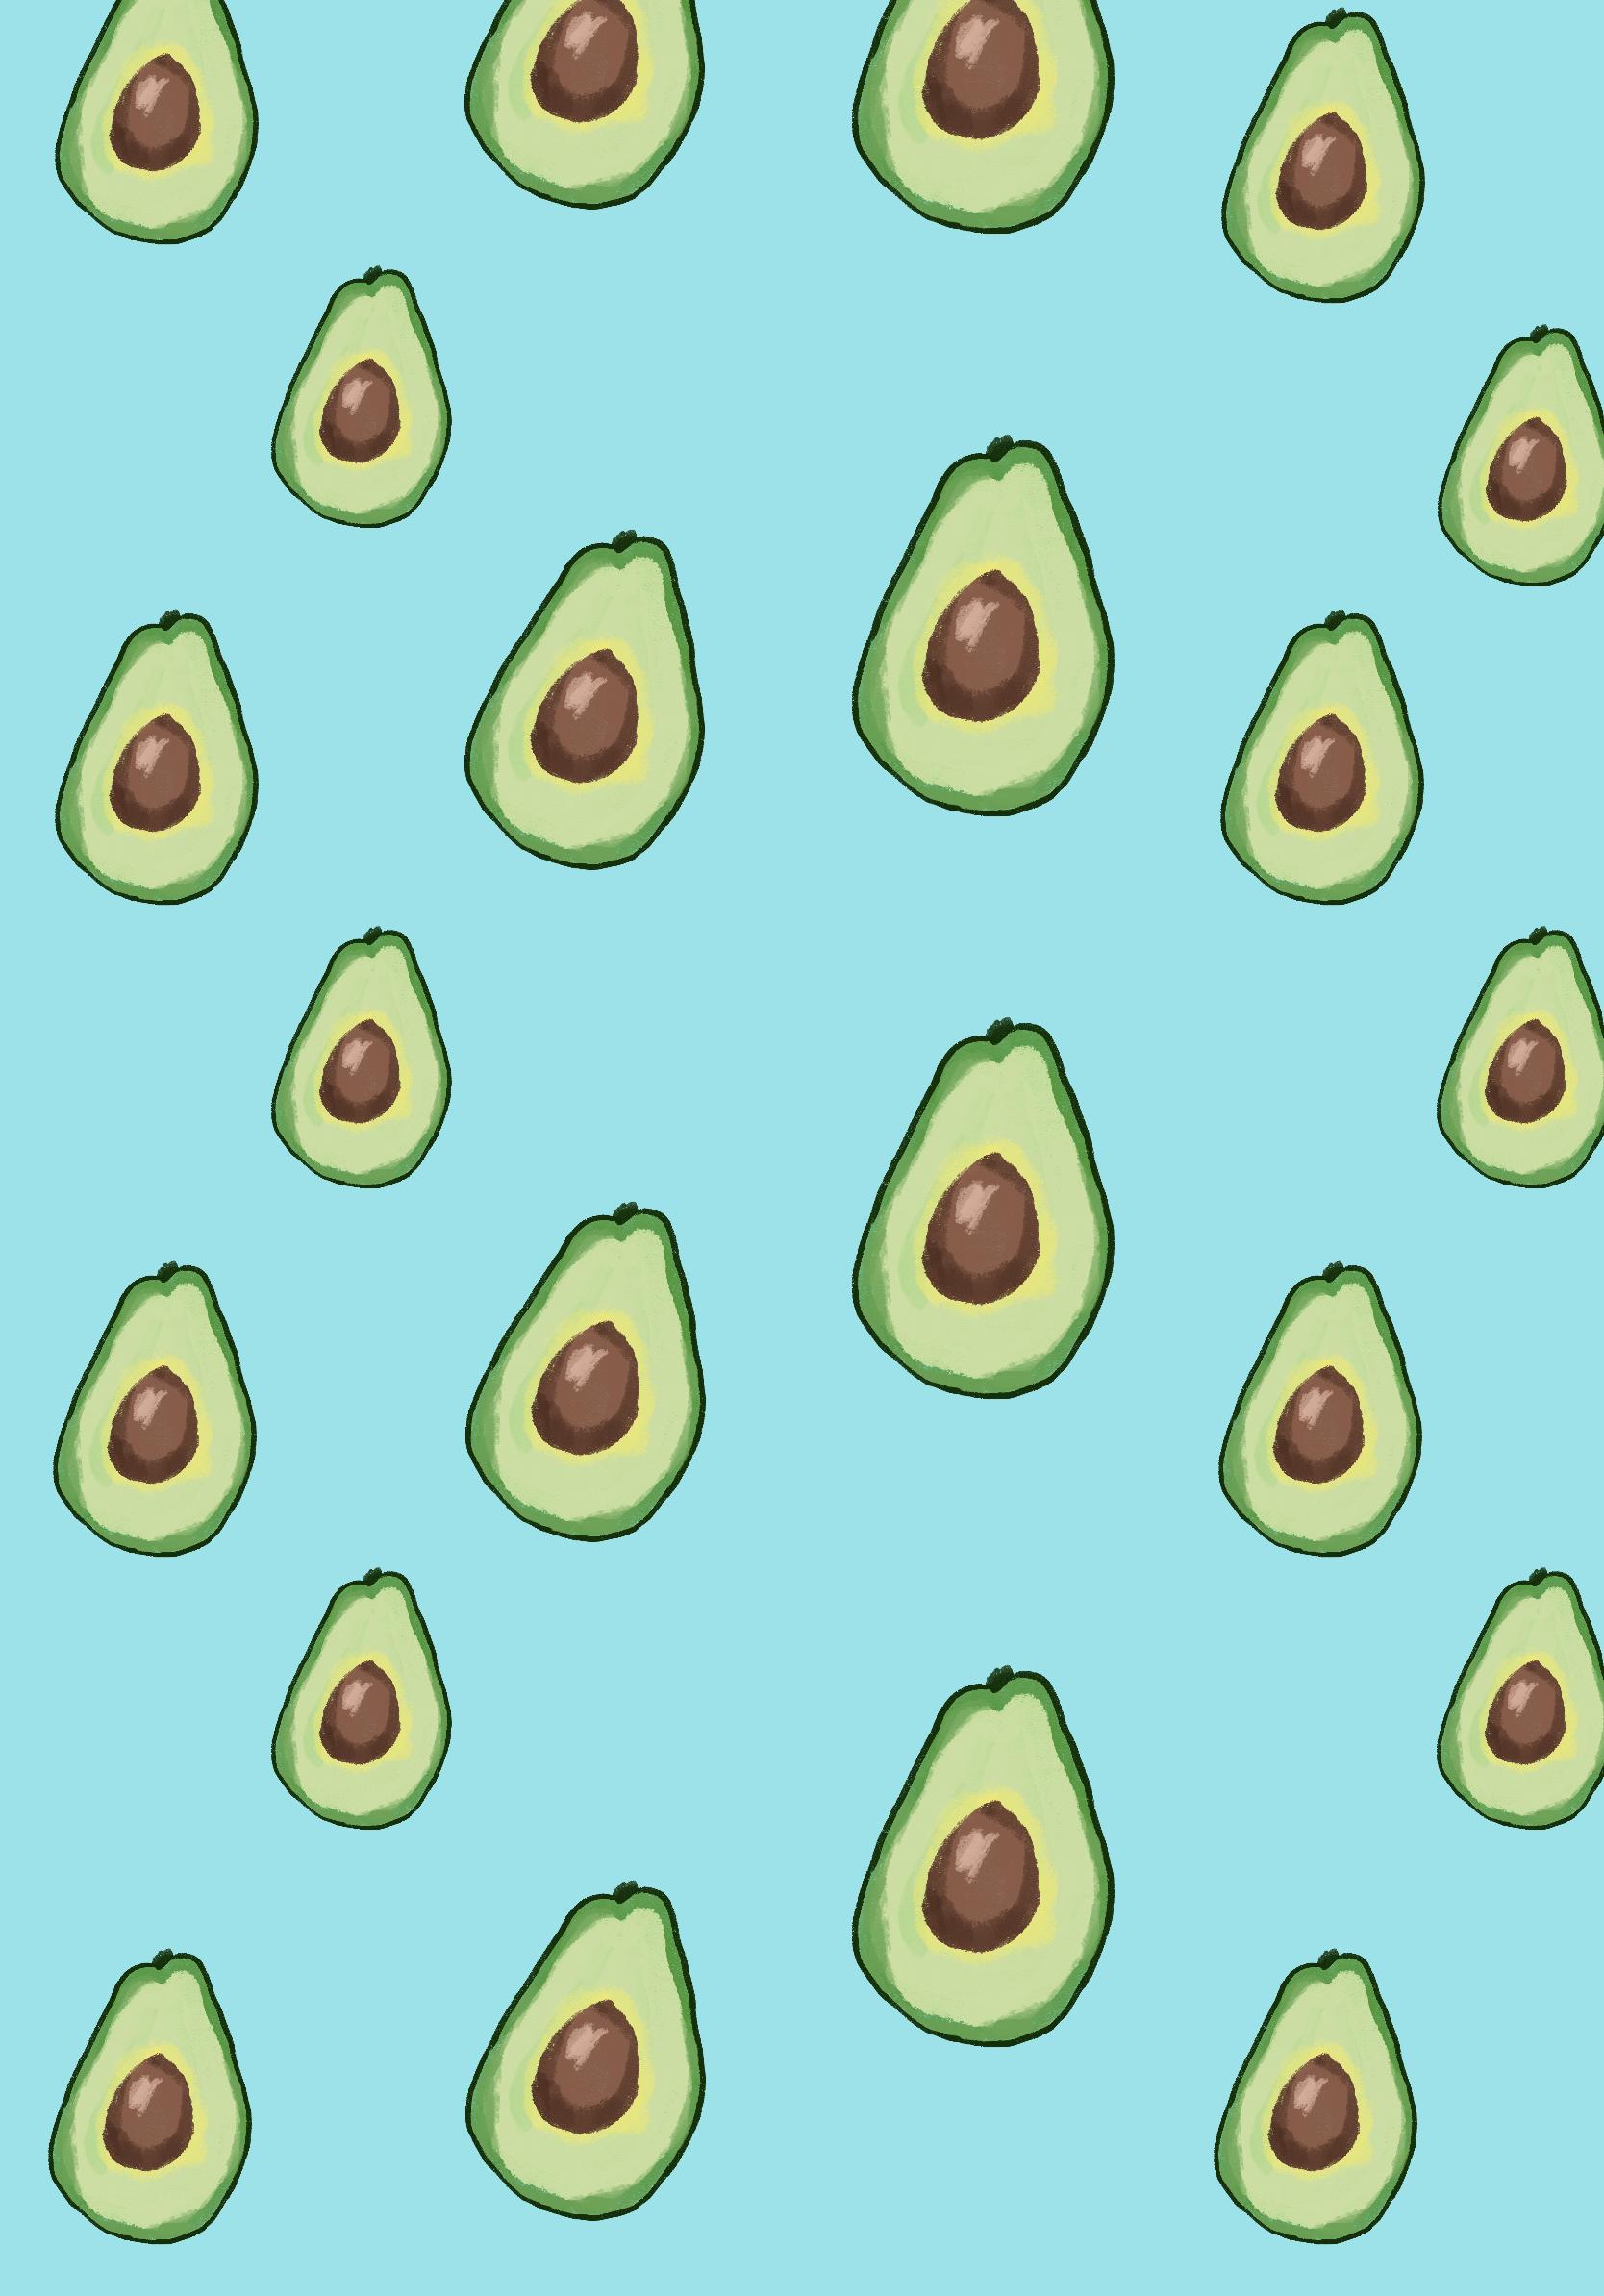 Avocado Wallpaper Ipad Pro Wallpaper Ipad Background Cute Wallpapers